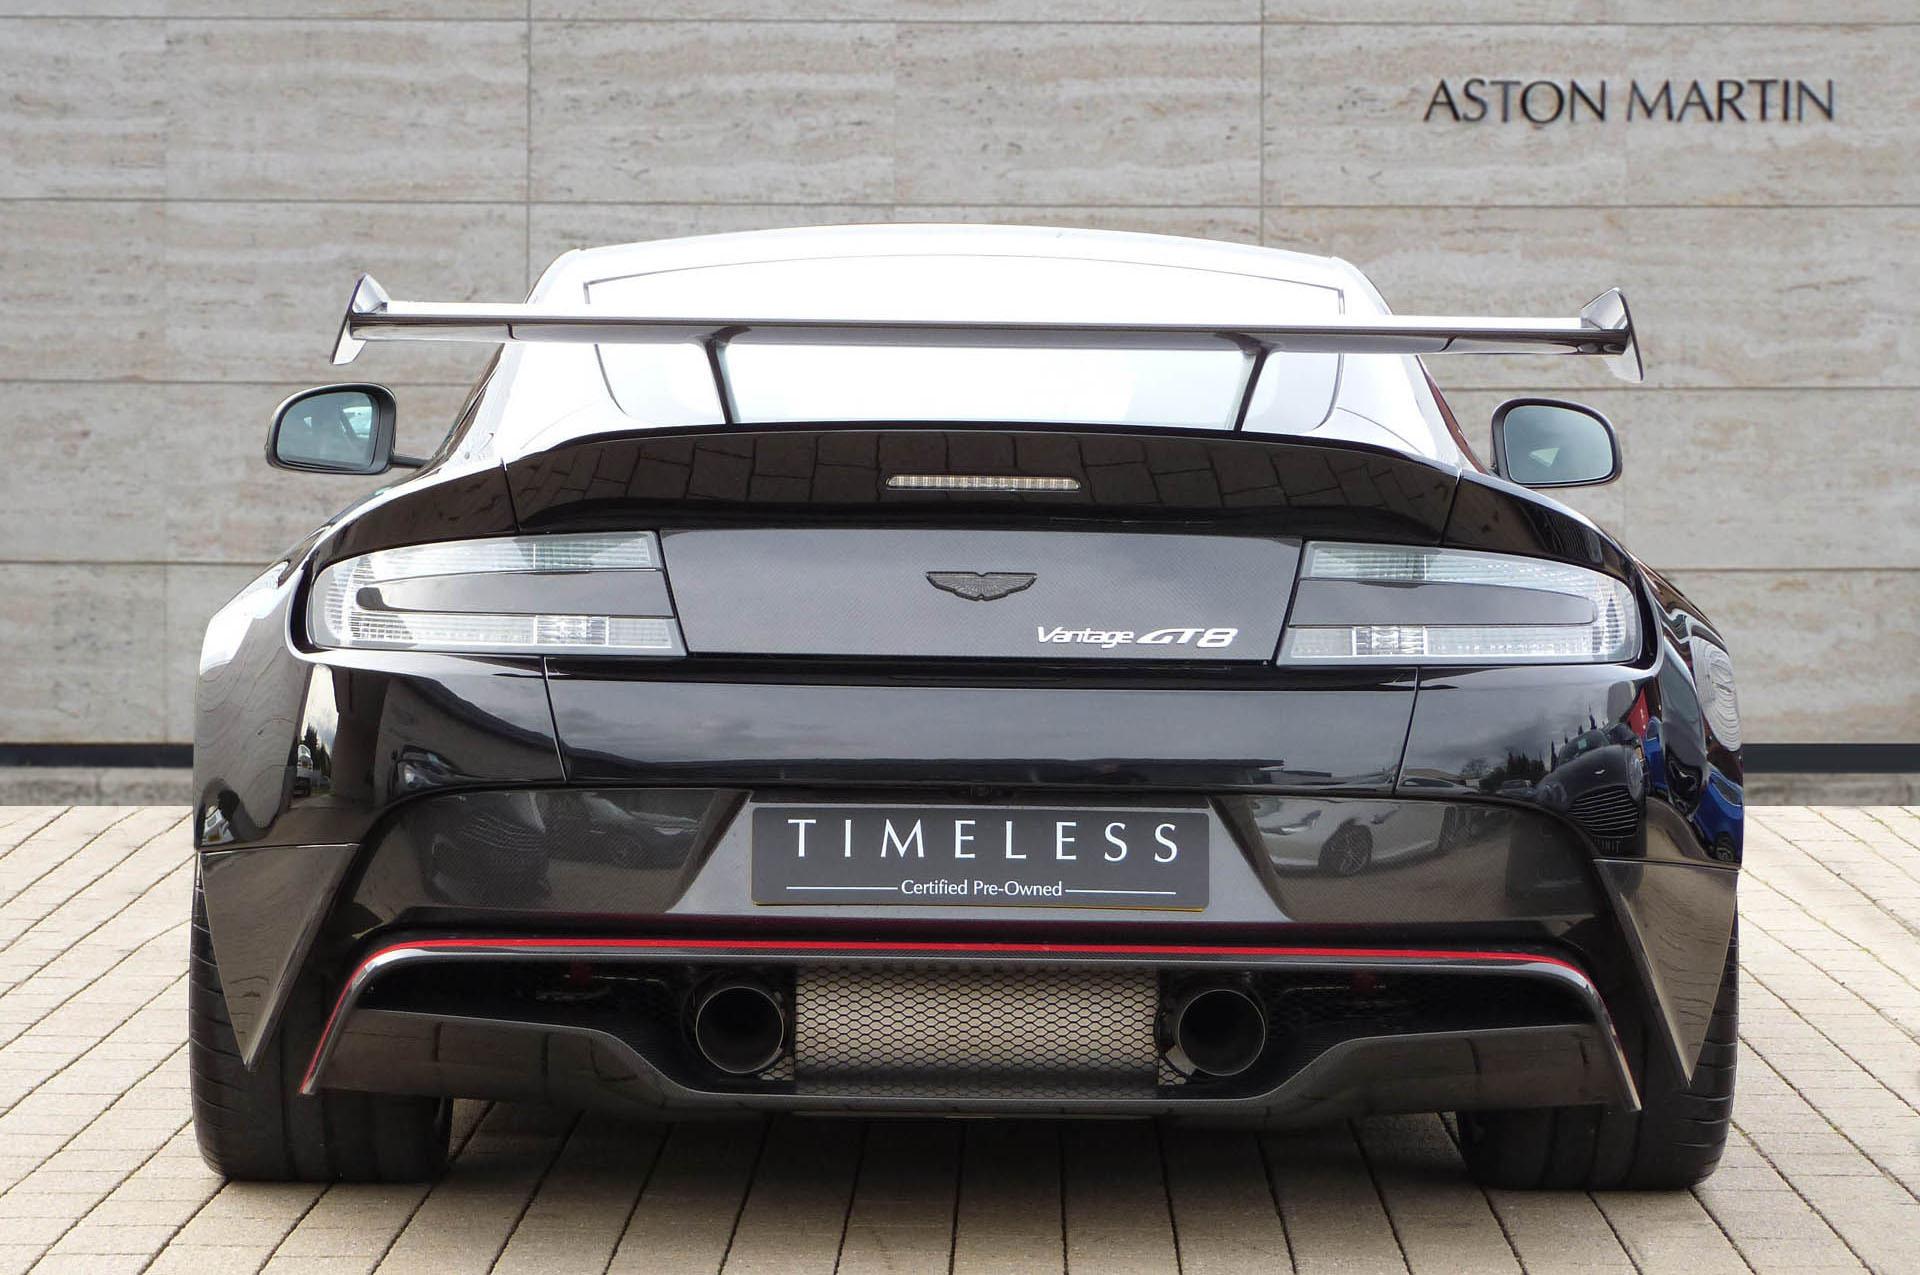 Rare Aston Martin Vantage Gt8 Goes On Sale